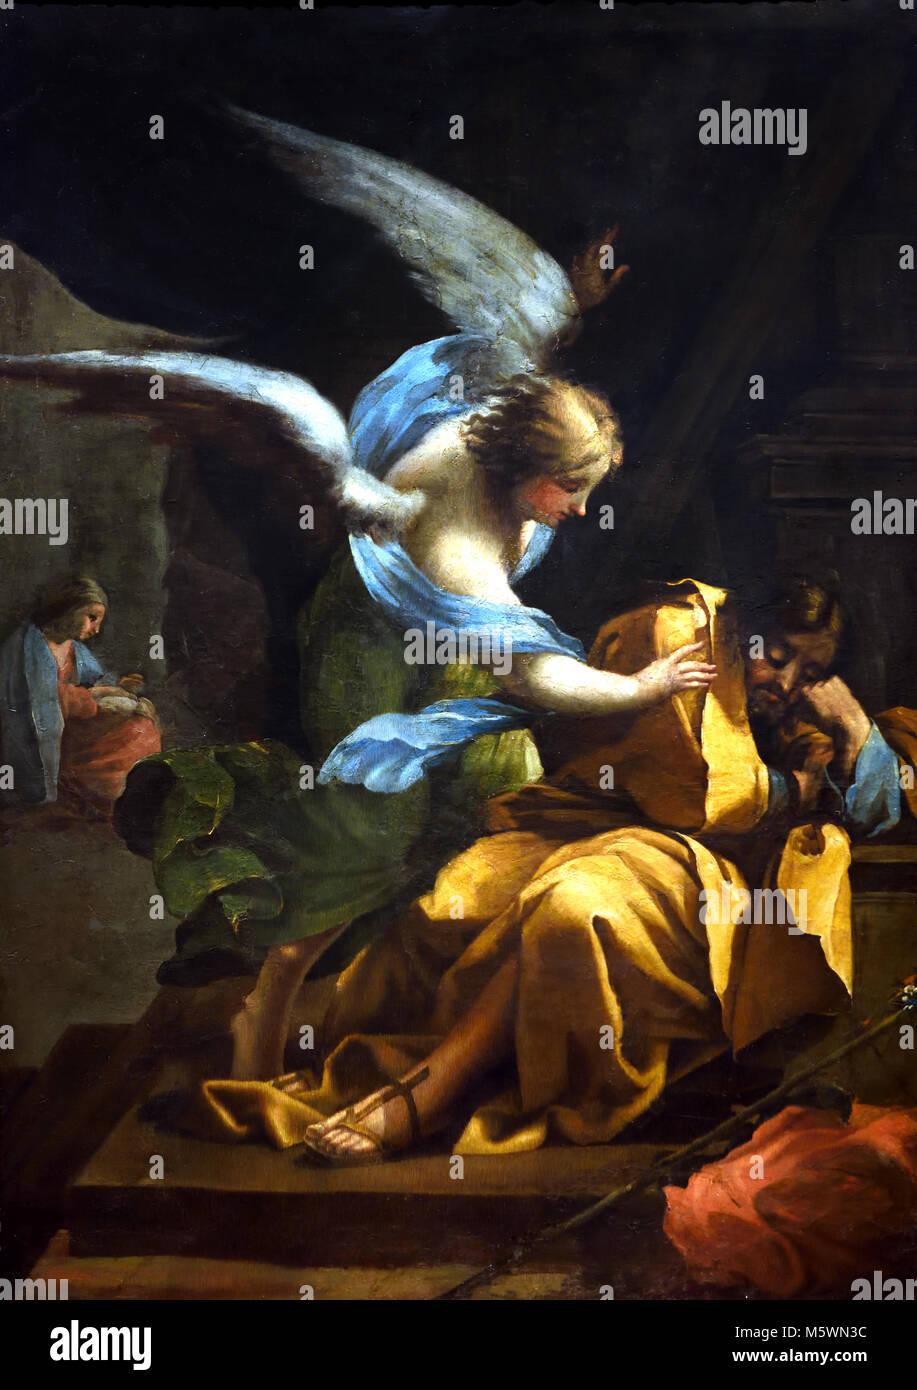 Dream of Saint Joseph 1772 FRANCISCO JOSÉ DE GOYA Y LUCIENTES (1746-1828) 18/19th, century, Spain, Spanish,( - Stock Image